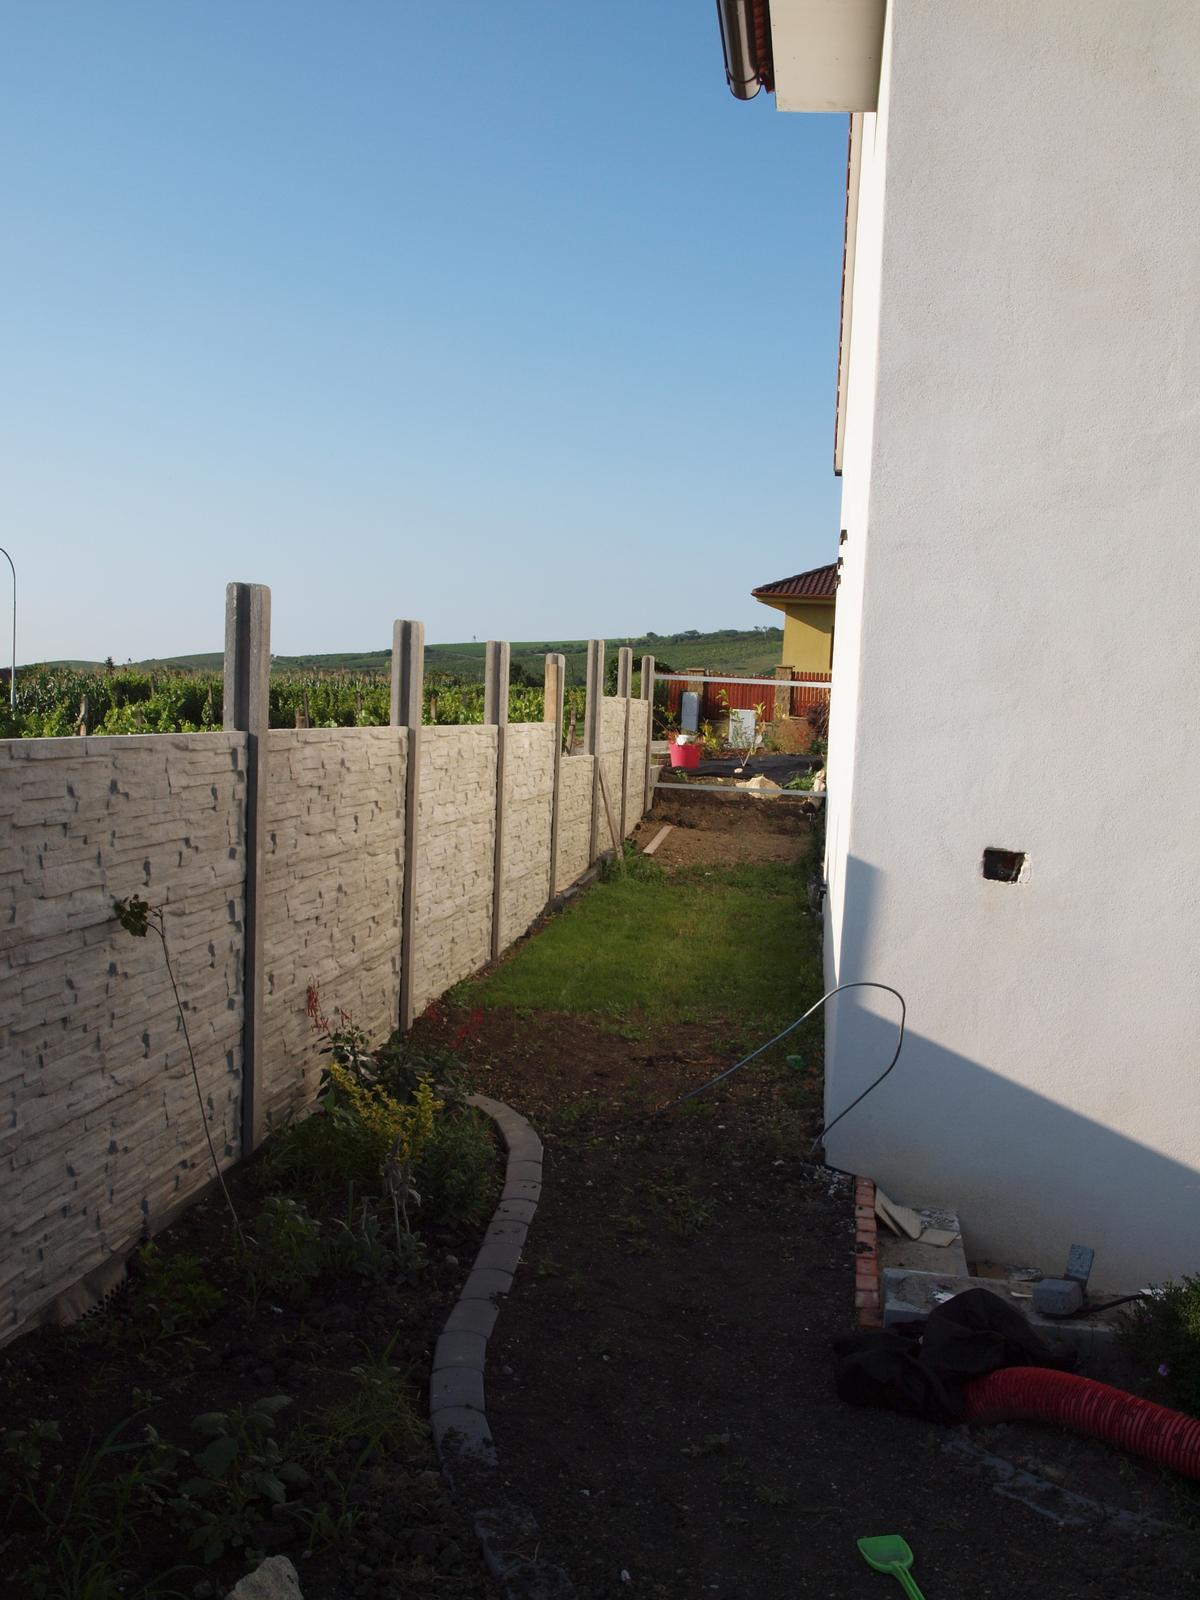 Zahrada - Obrázek č. 83